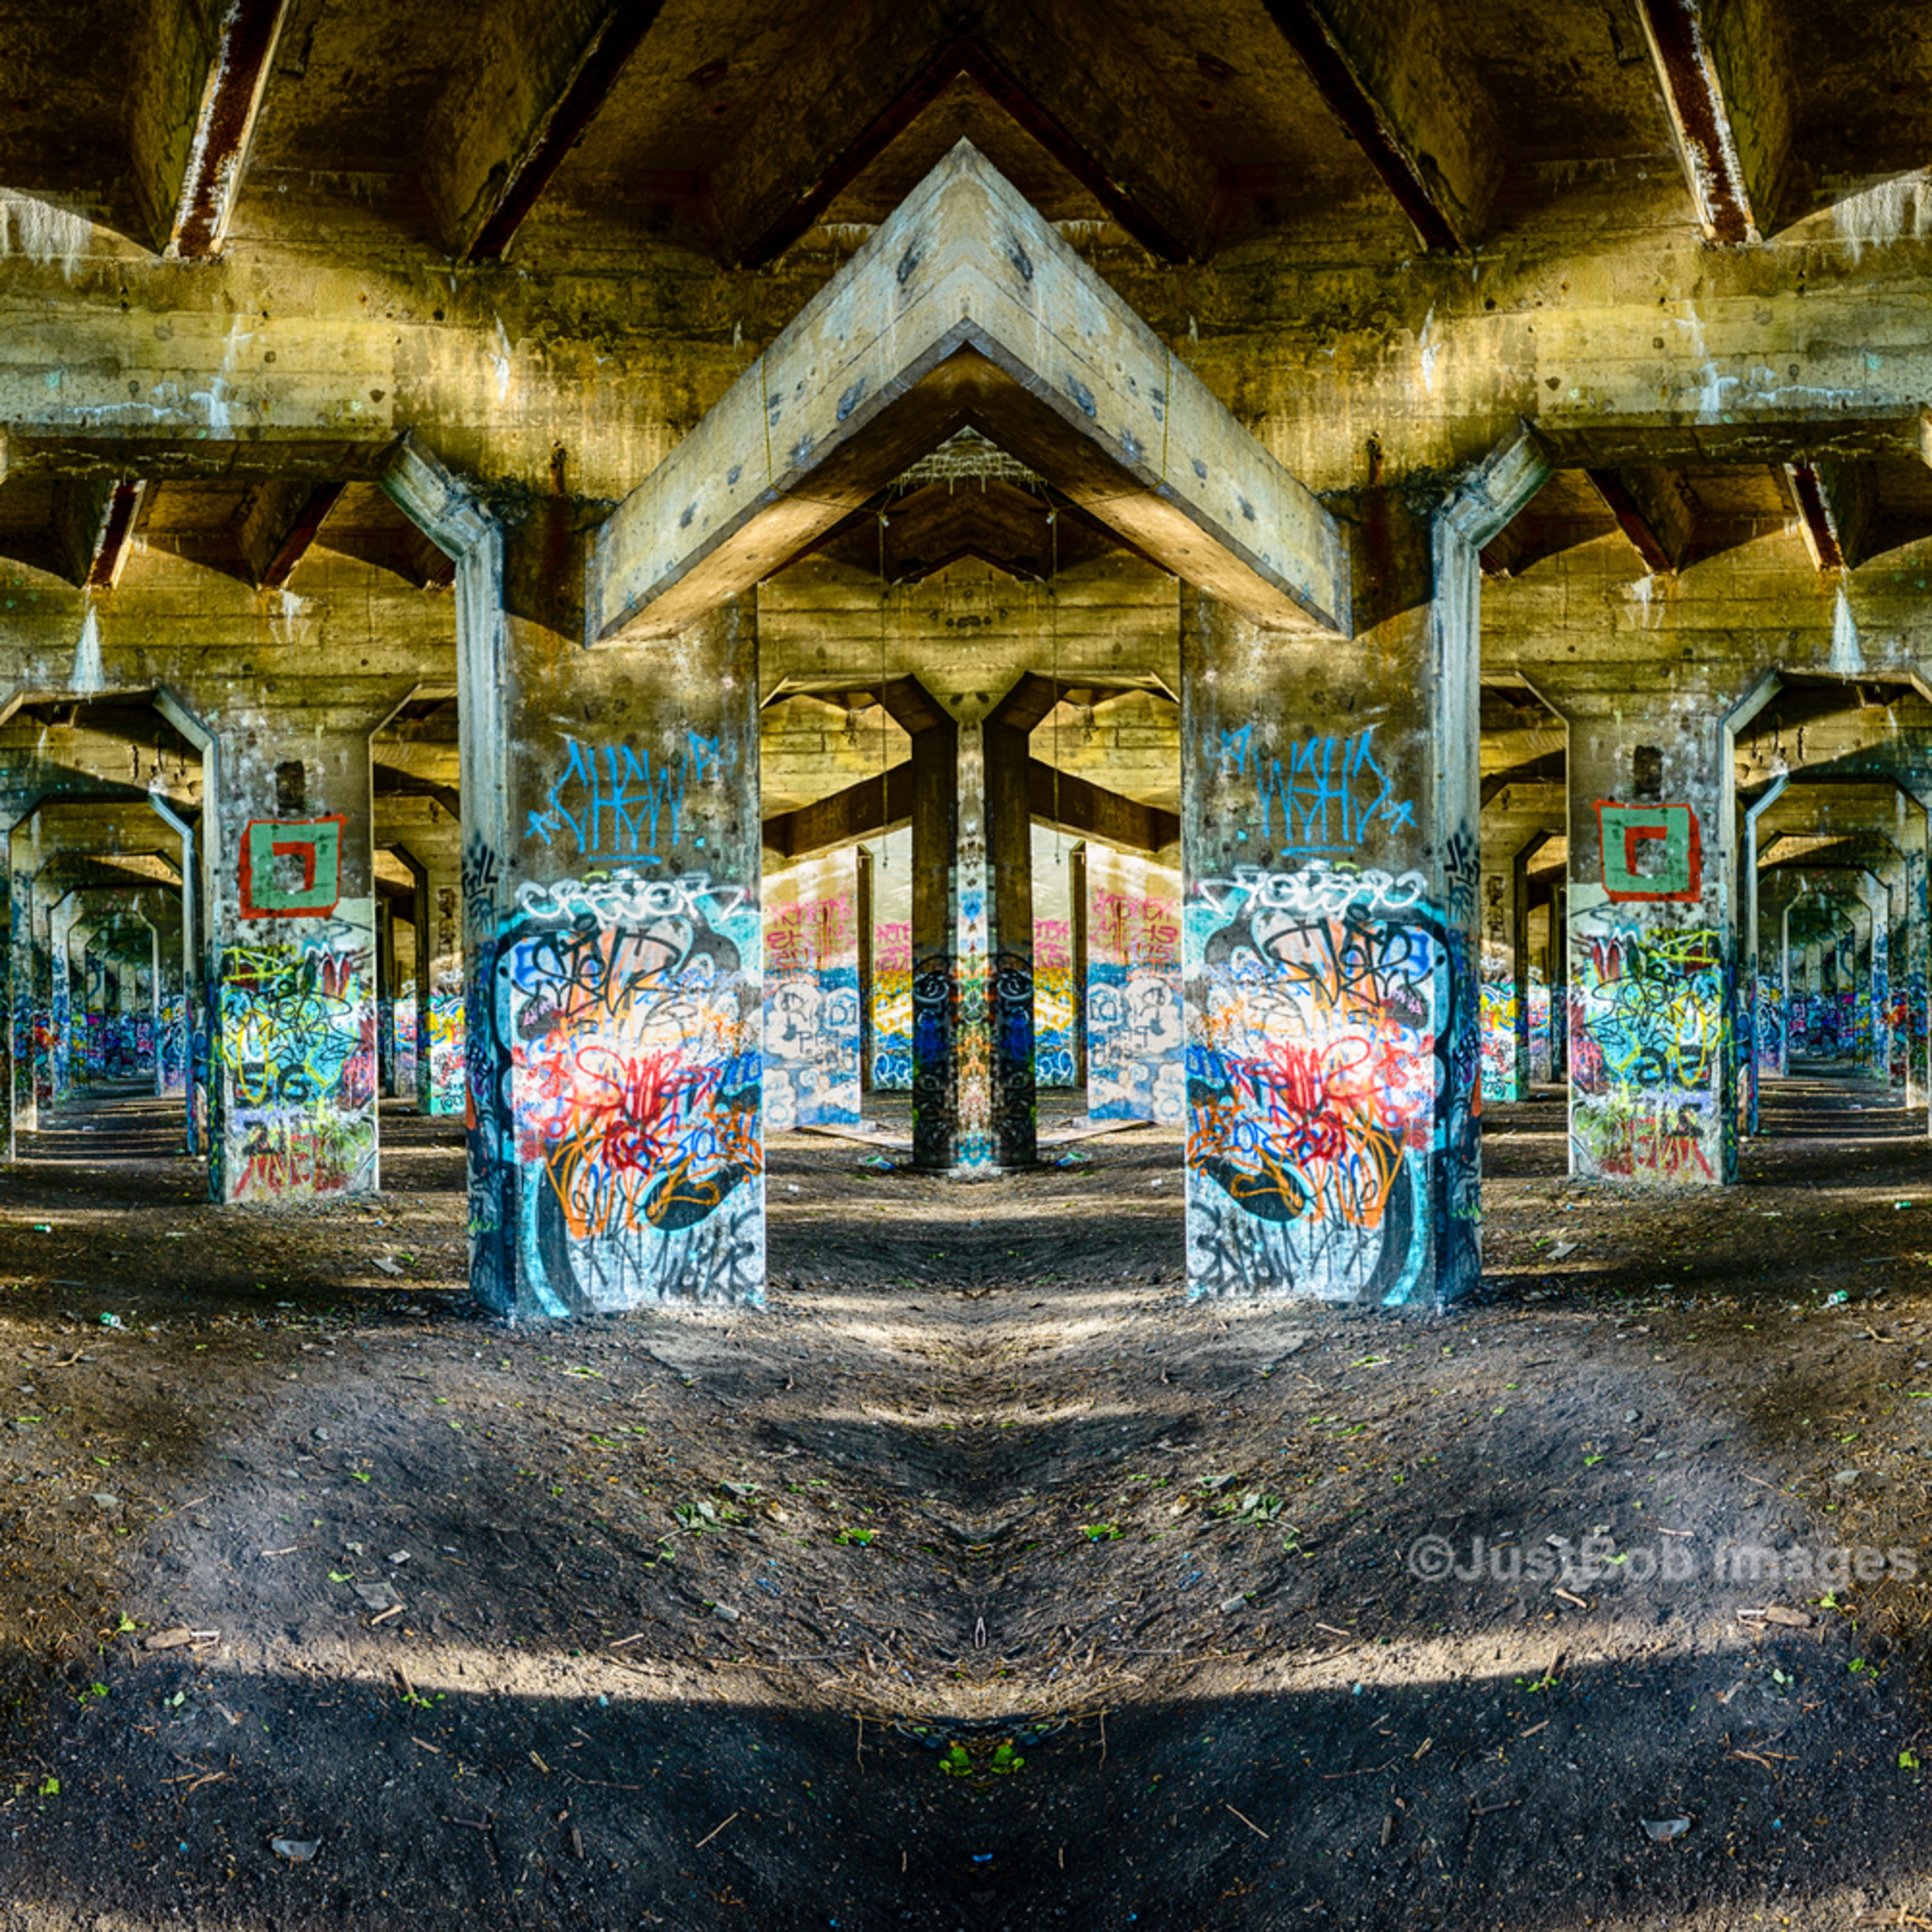 Graffiti 20160611 0436 hdr edit vza9np